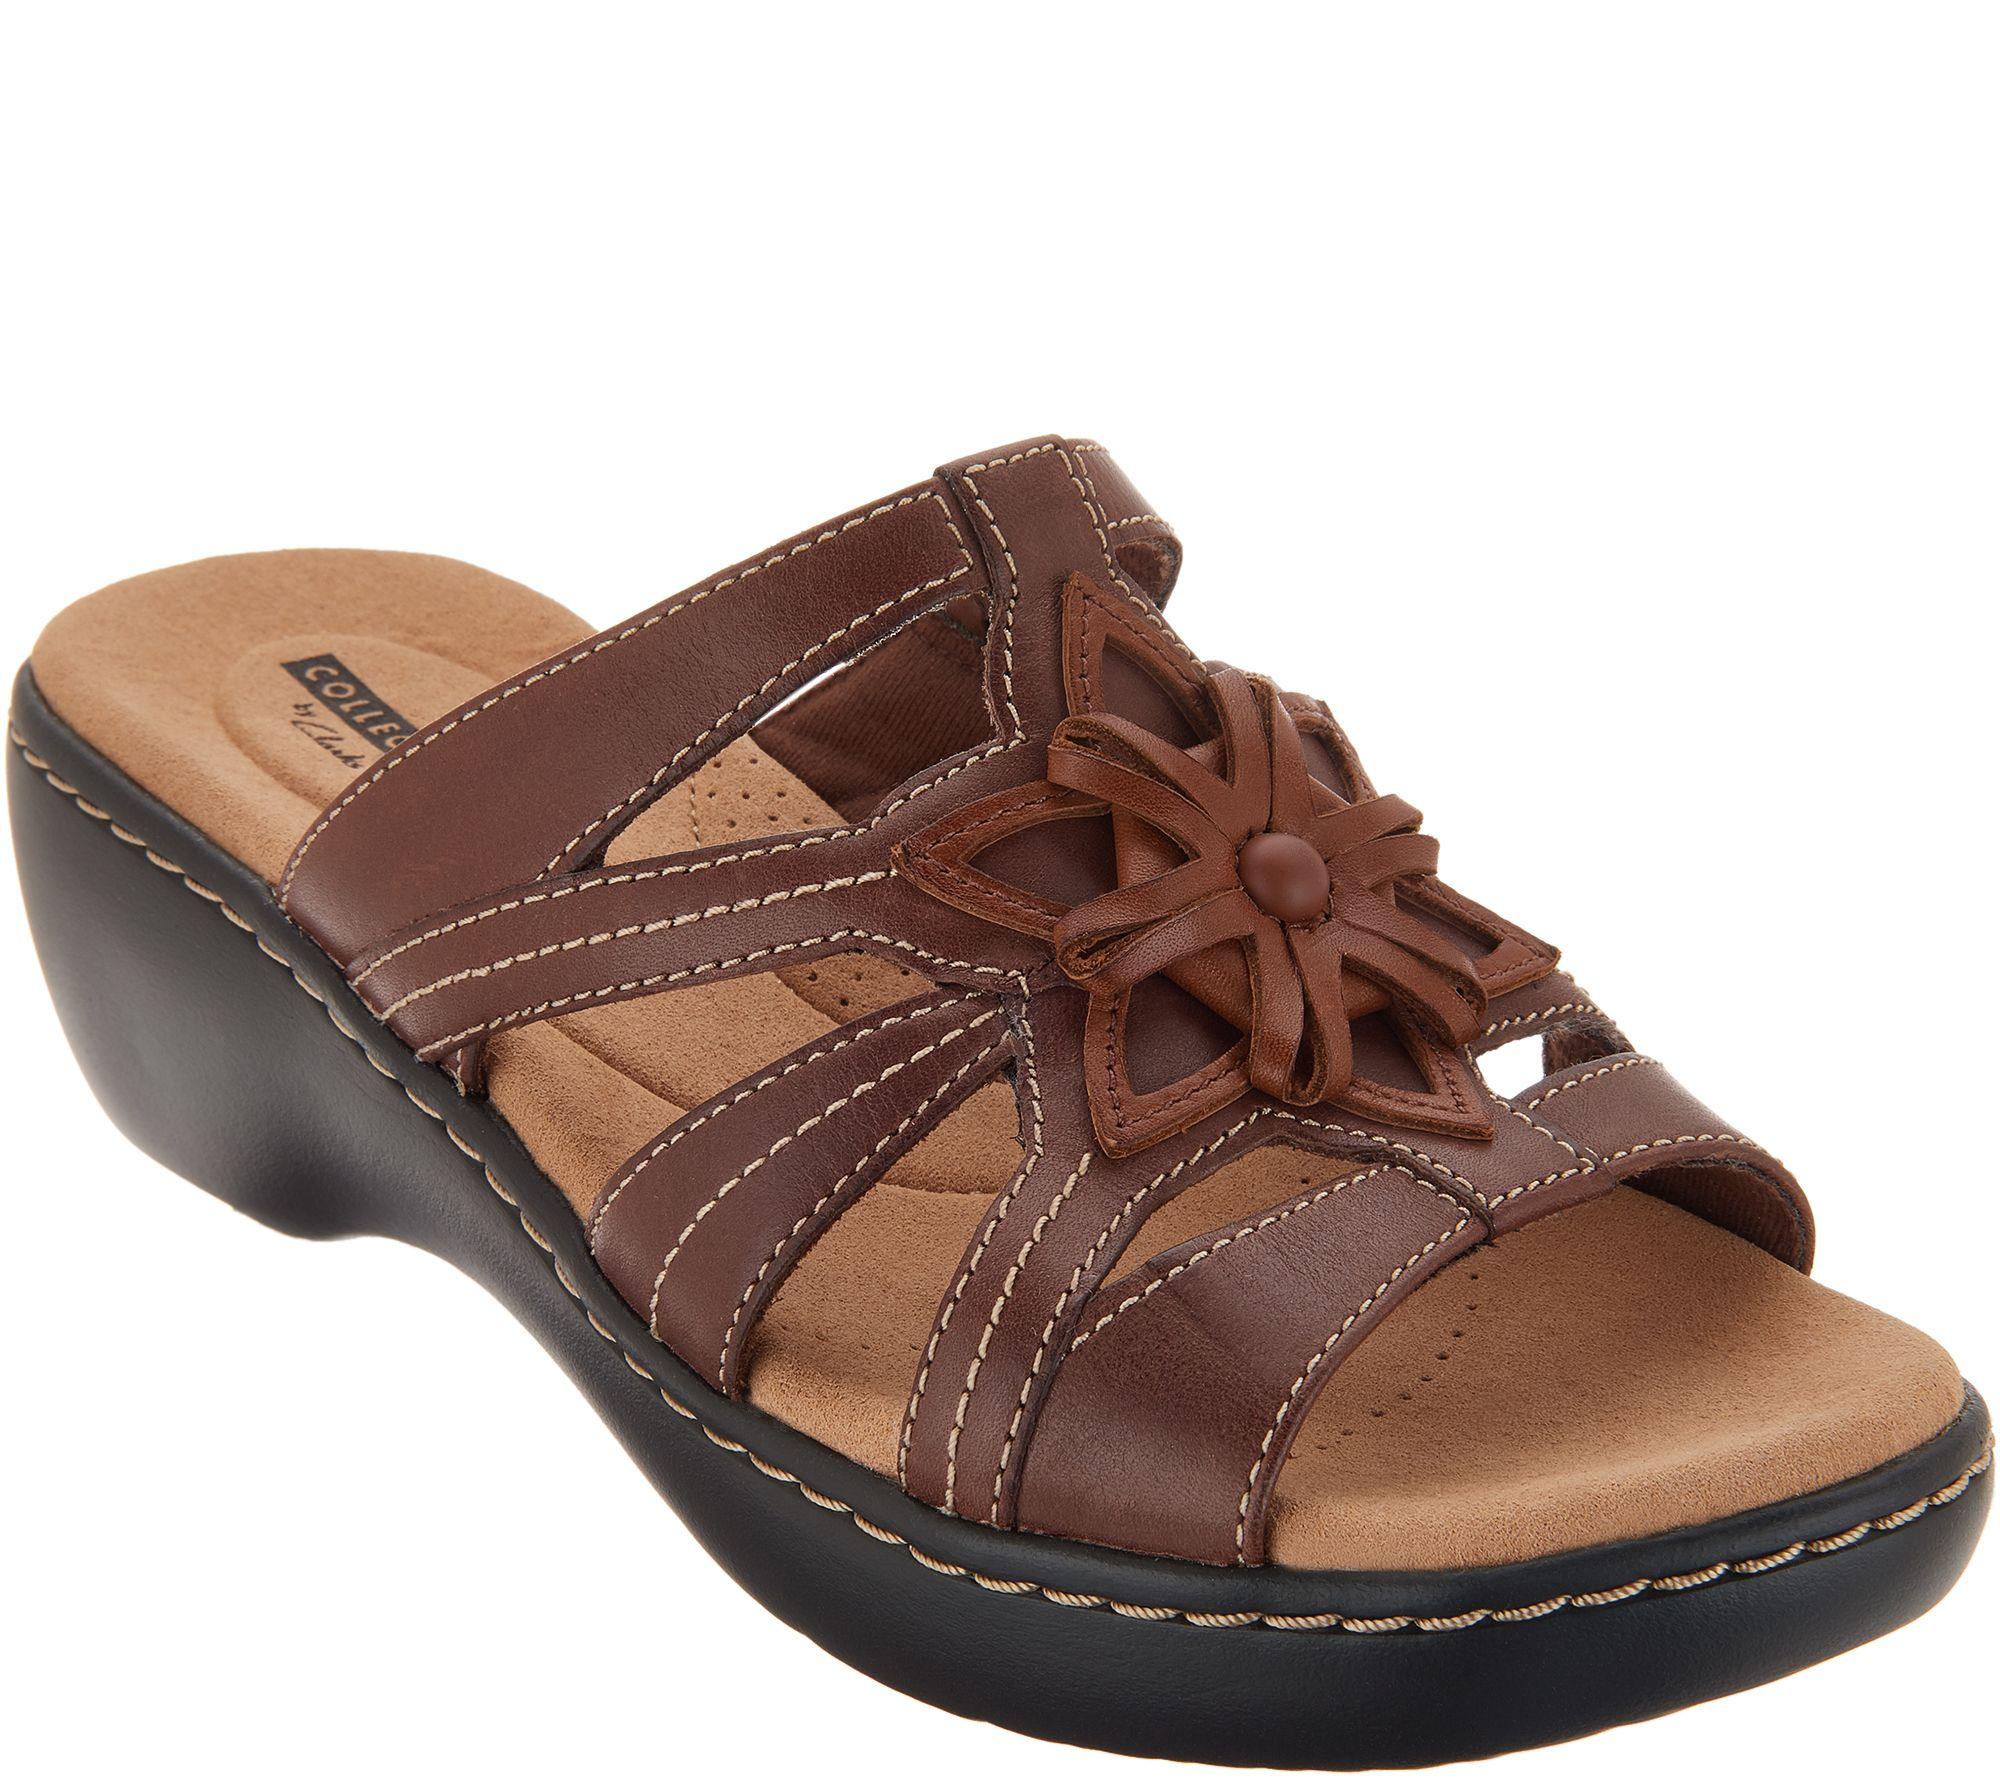 1b496230d20b Clarks Leather Lightweight Floral Detail Slides - Delana Venna - Page 1 —  QVC.com